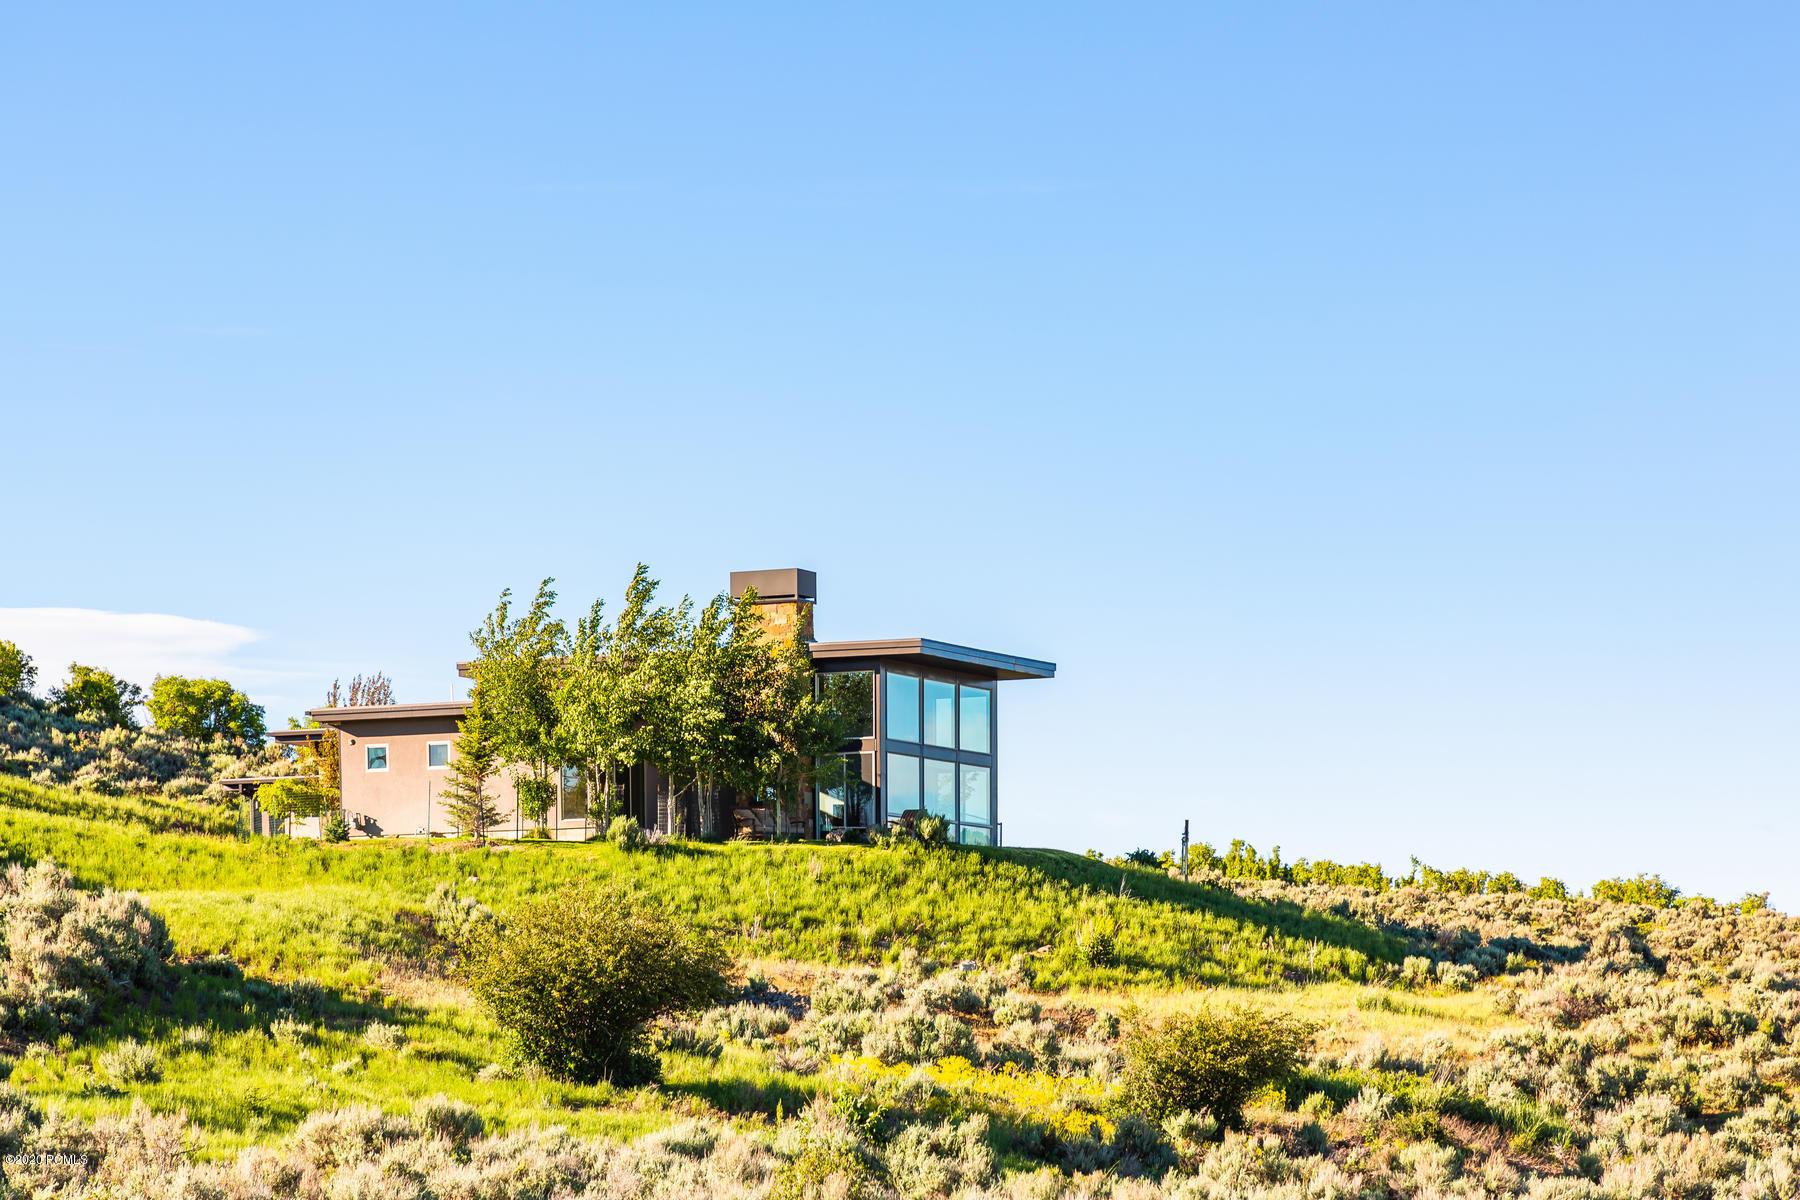 8536 Highfield Road, Park City, Utah 84098, 2 Bedrooms Bedrooms, ,2 BathroomsBathrooms,Single Family,For Sale,Highfield,20190109112430415765000000